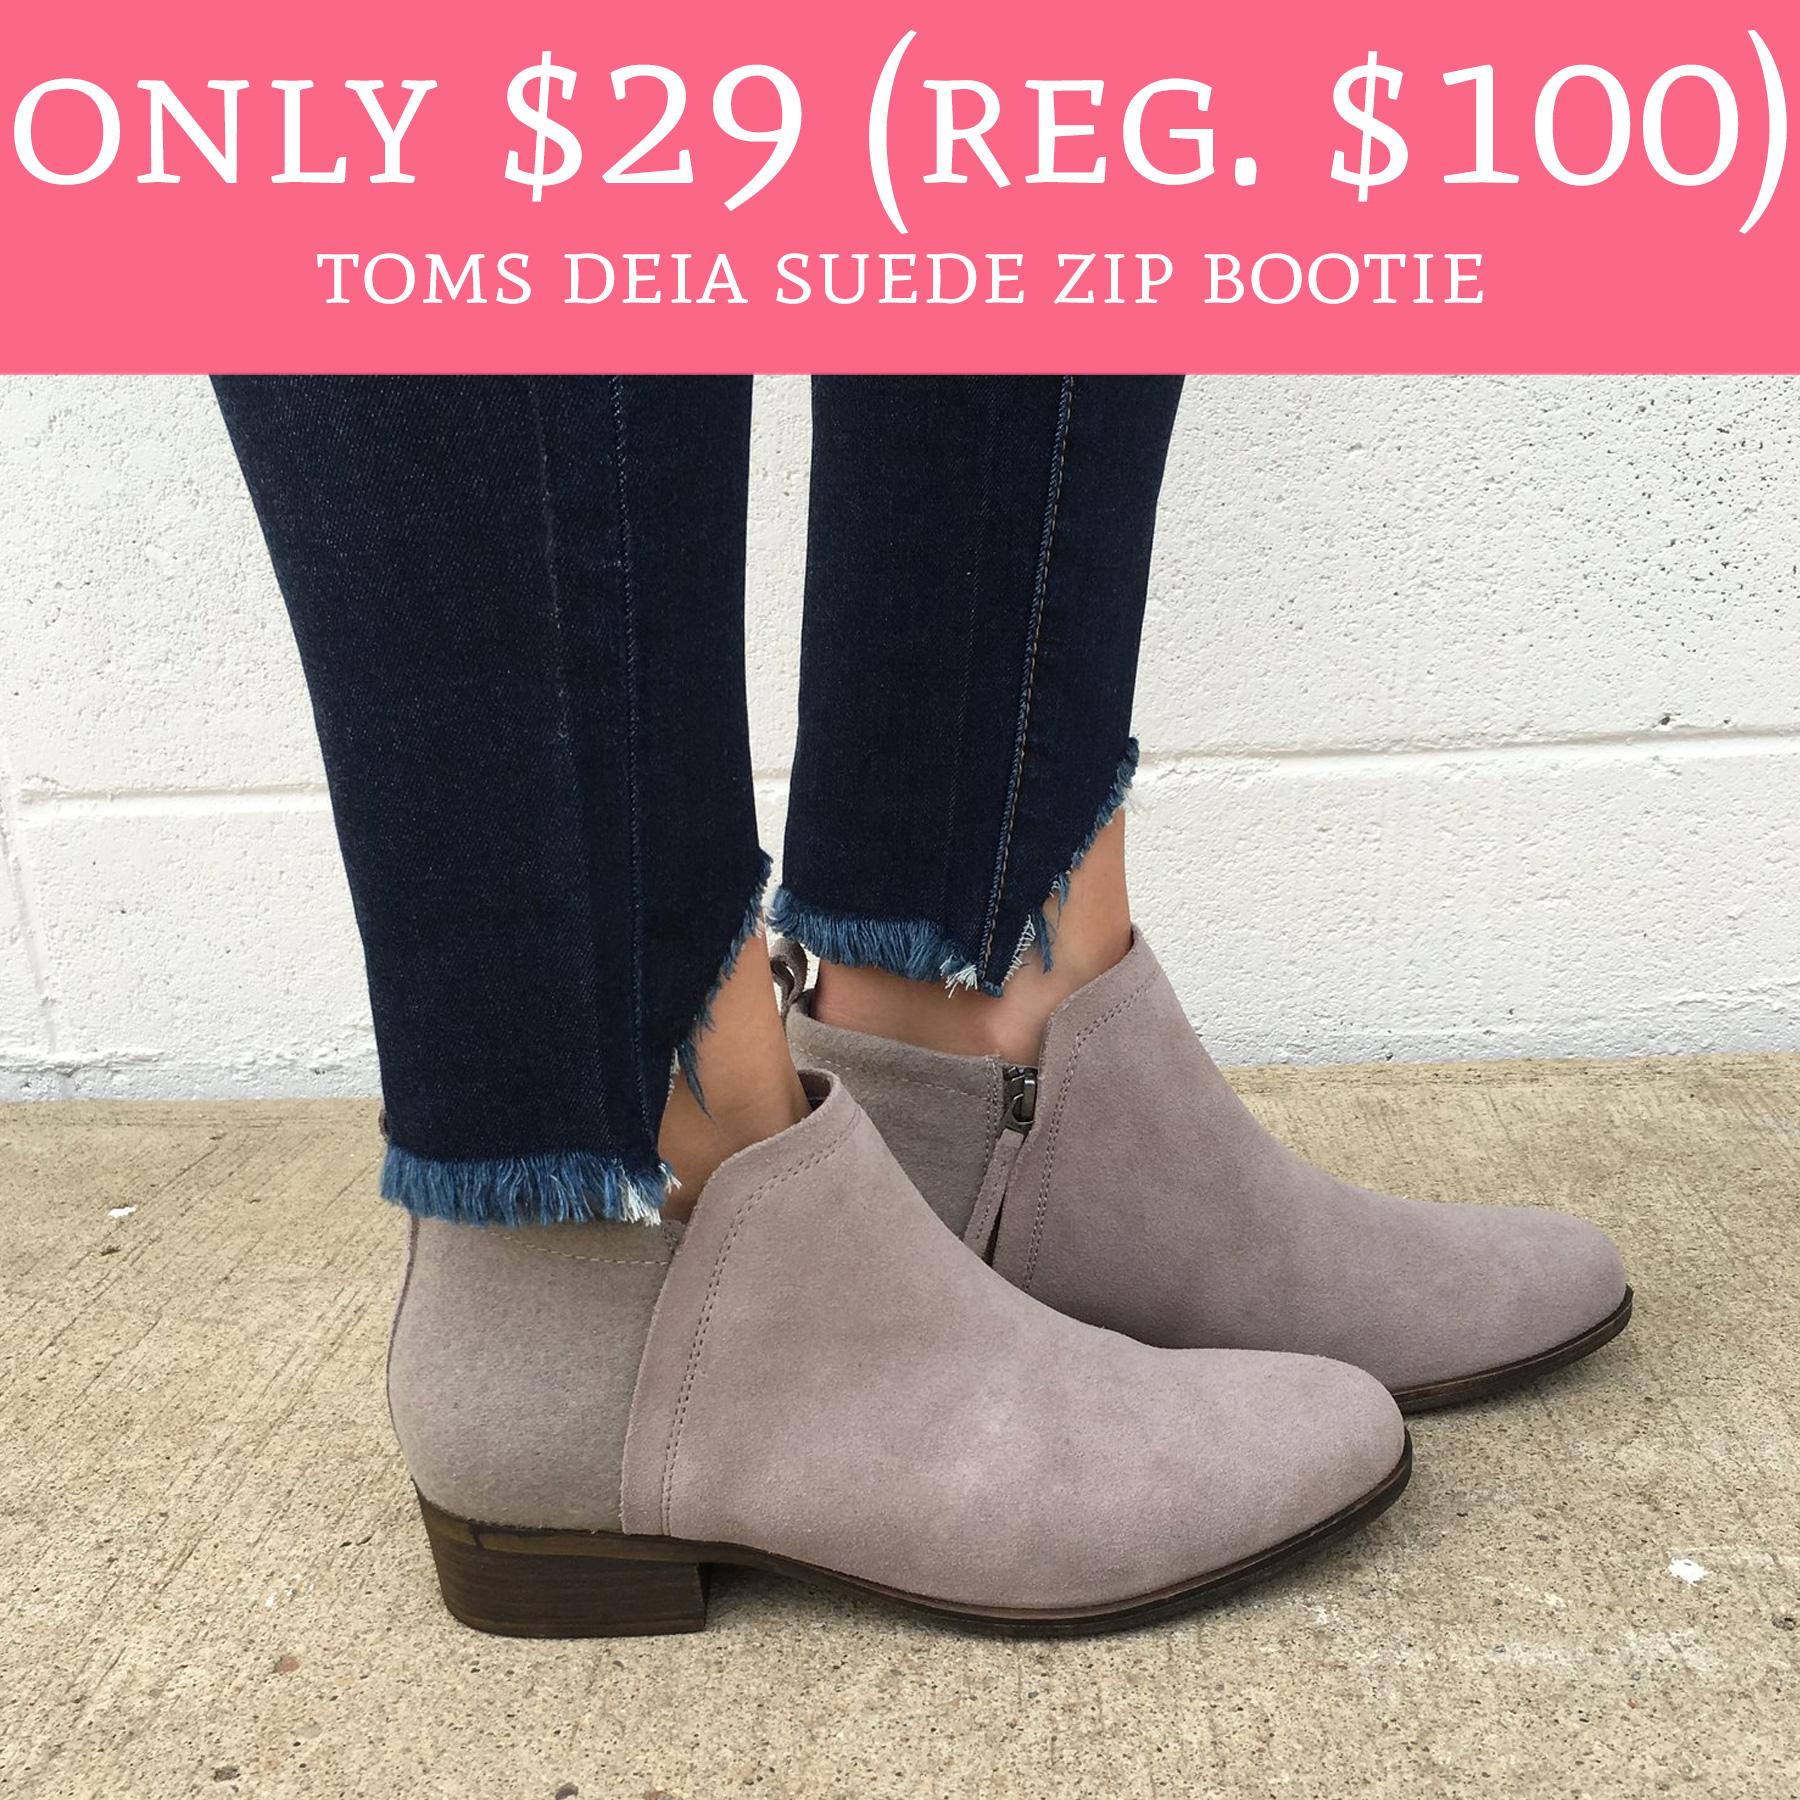 Only $29 (Regular $100) Toms Deia Suede